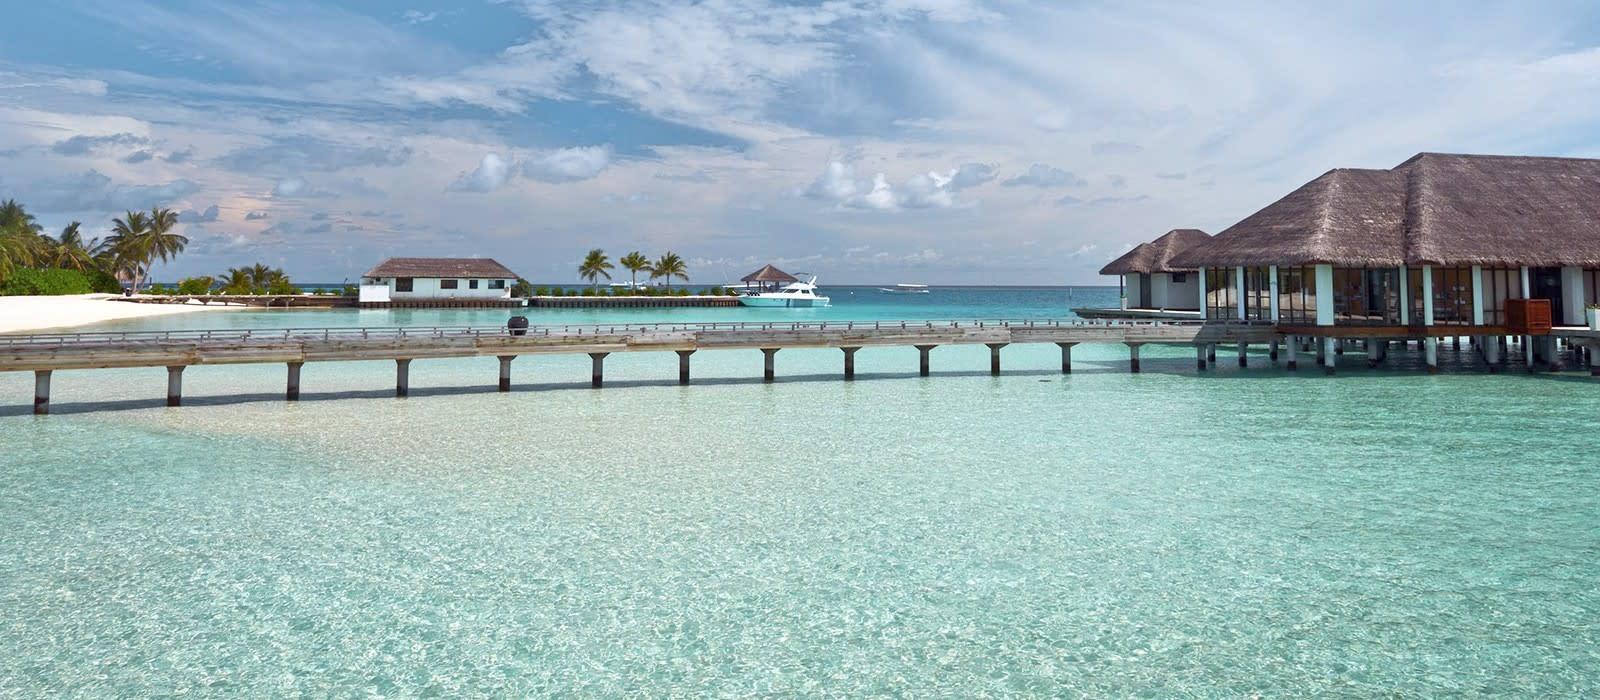 Sri Lankan Heritage and Maldives Luxury Tour Trip 1